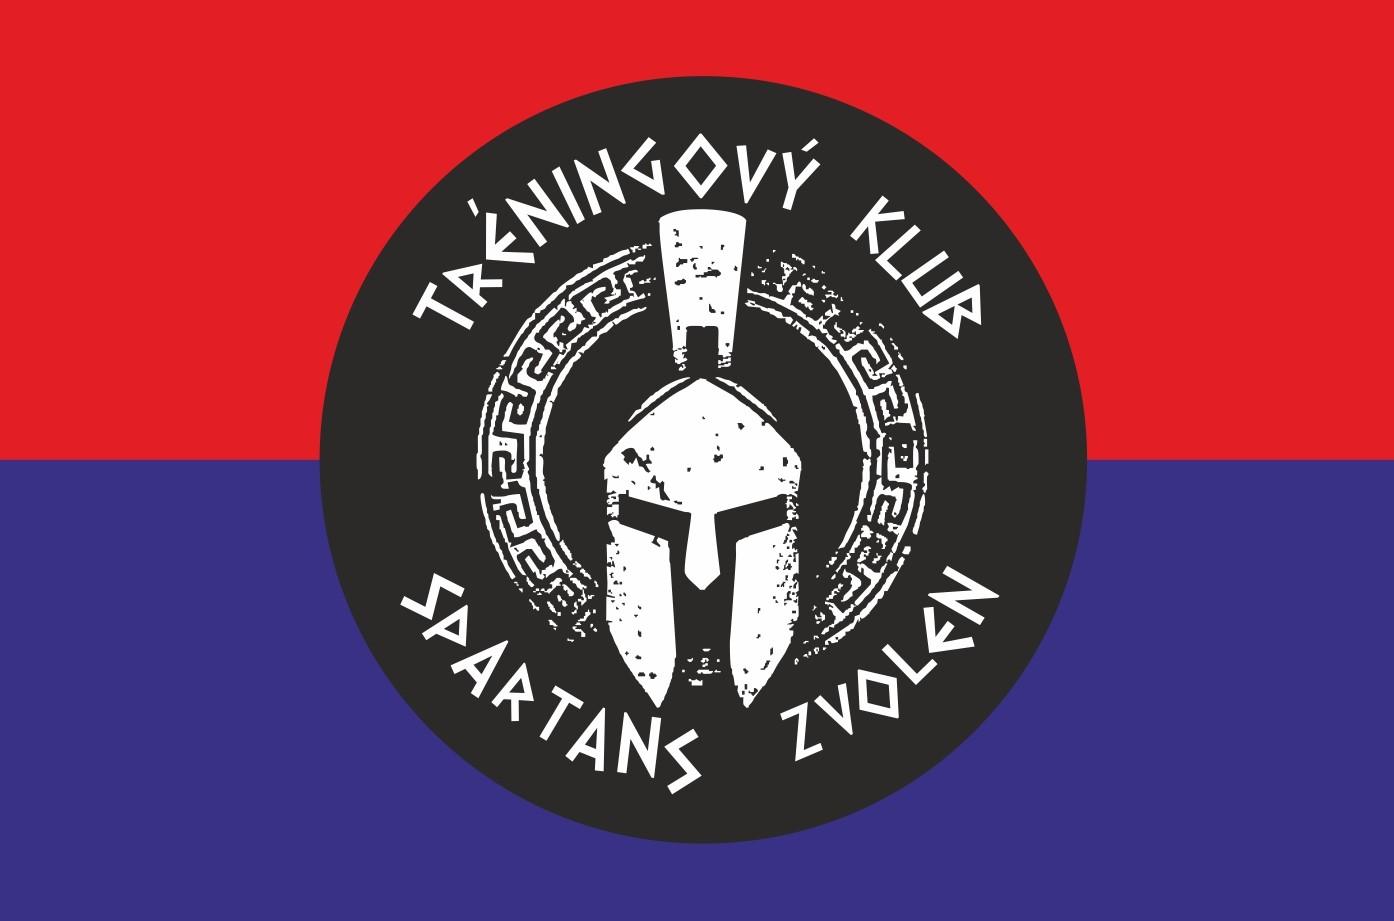 /images/com_odtatierkdunaju/teams/2021_Spartans-Zvolen---Chamra--.jpg